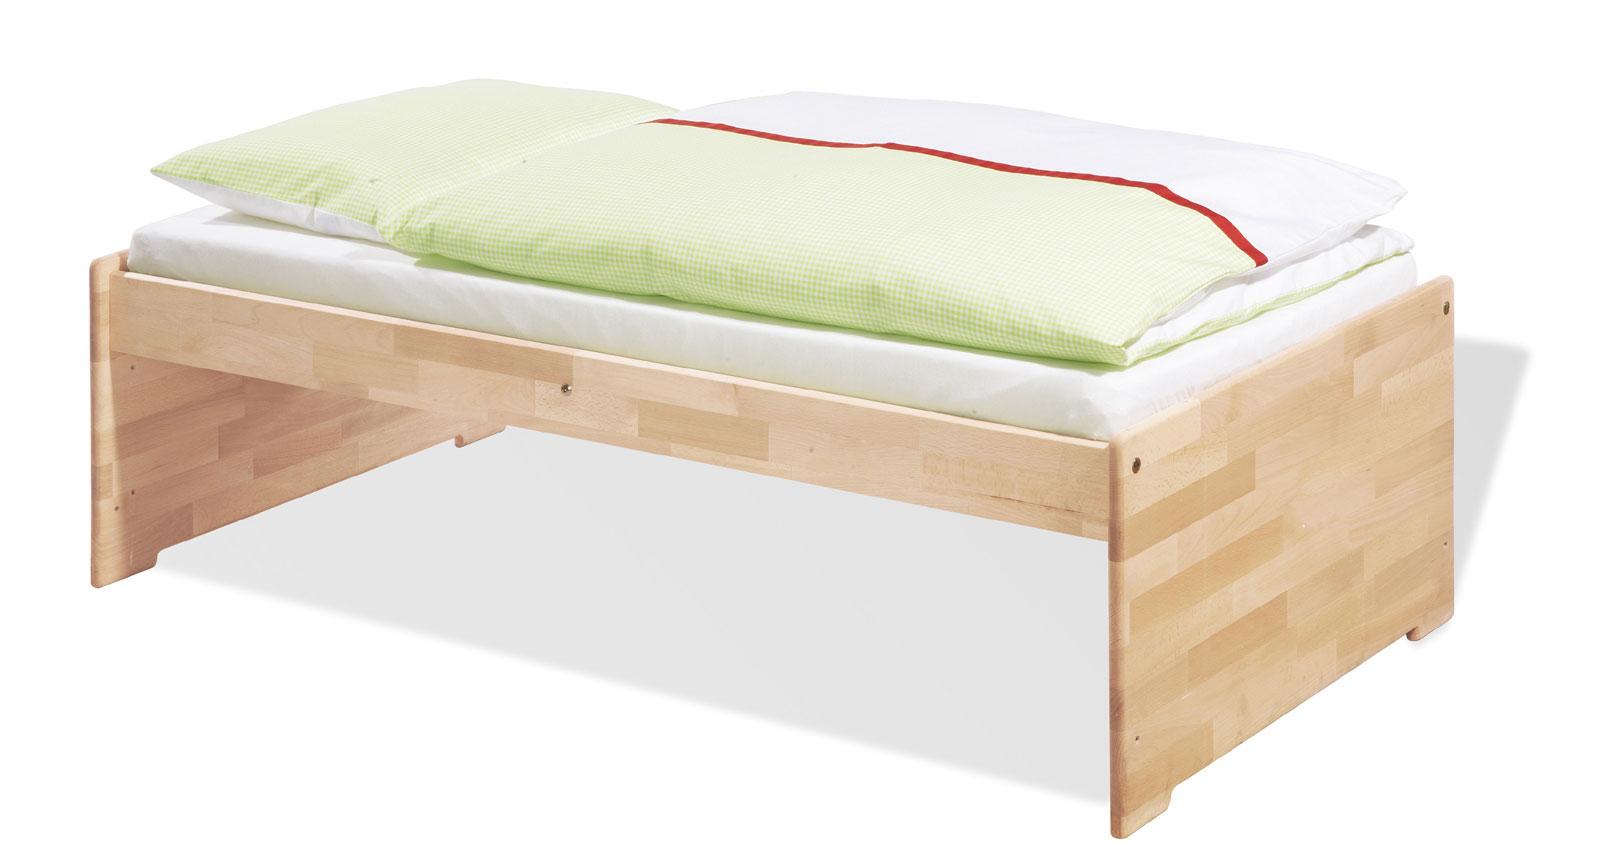 kinderbett natura mit lattenrost in 70x240 cm von. Black Bedroom Furniture Sets. Home Design Ideas